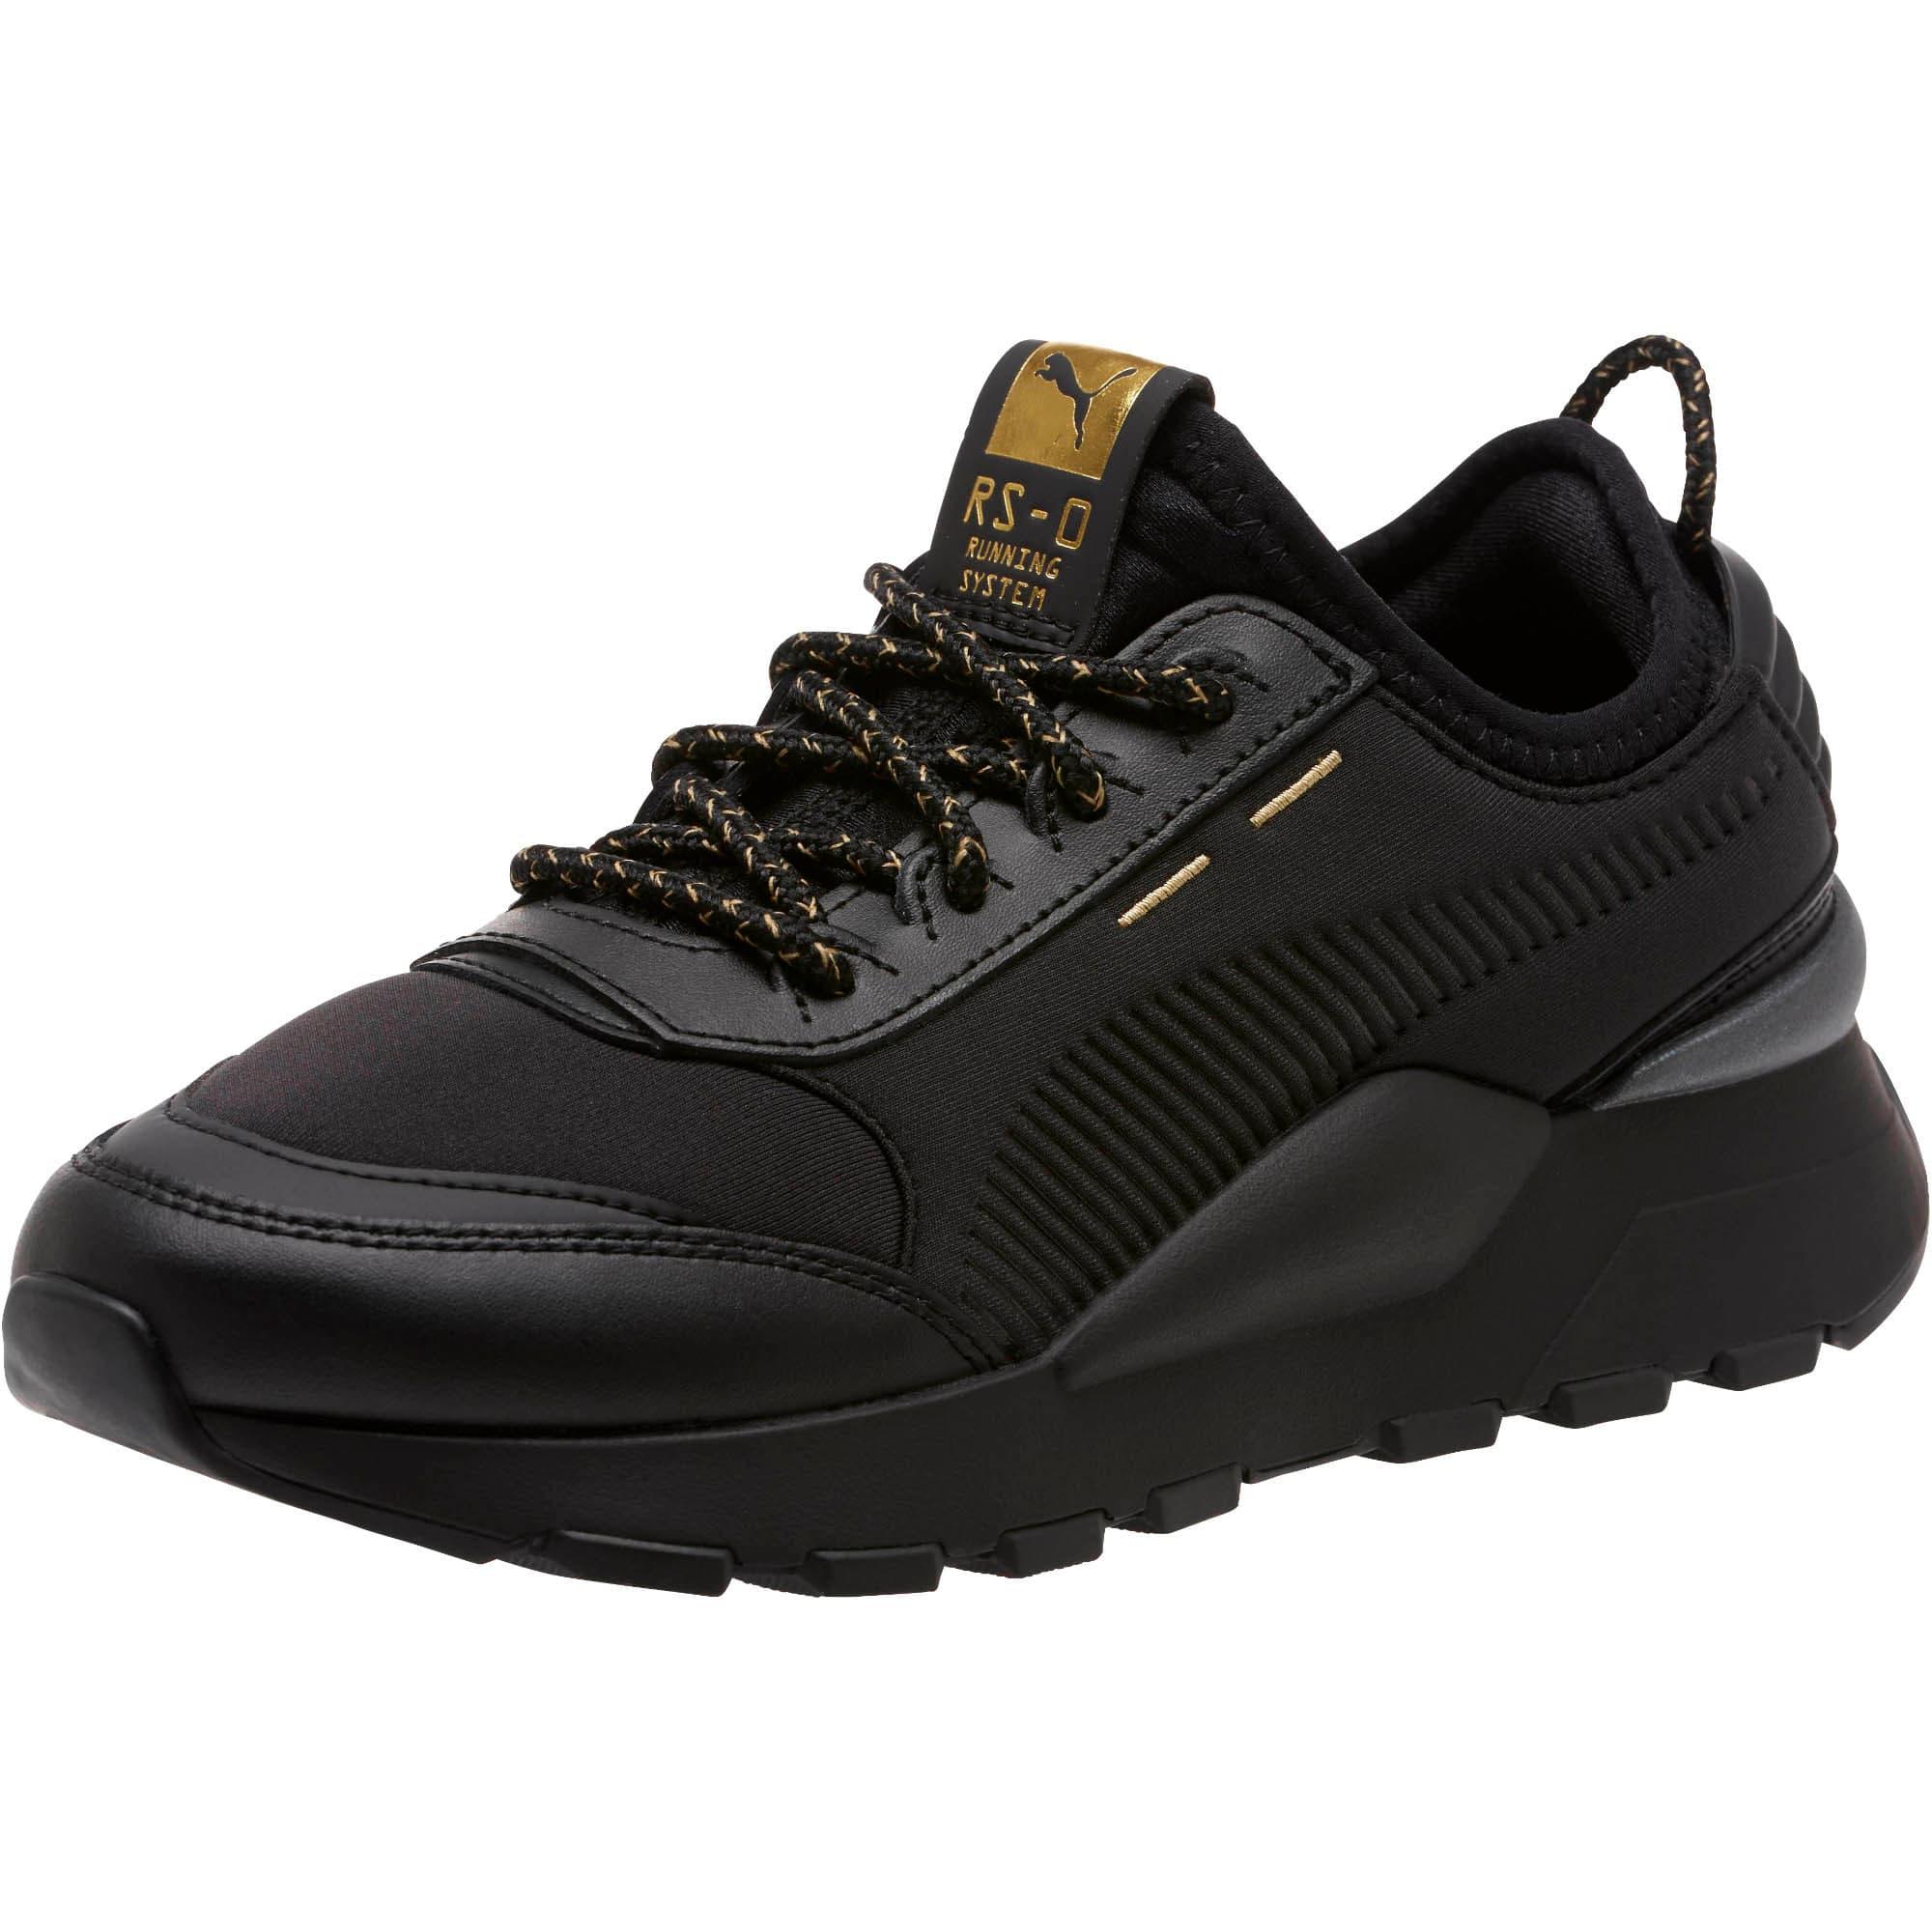 Thumbnail 1 of RS-0 Trophy Sneakers JR, Puma Black-Puma Black, medium